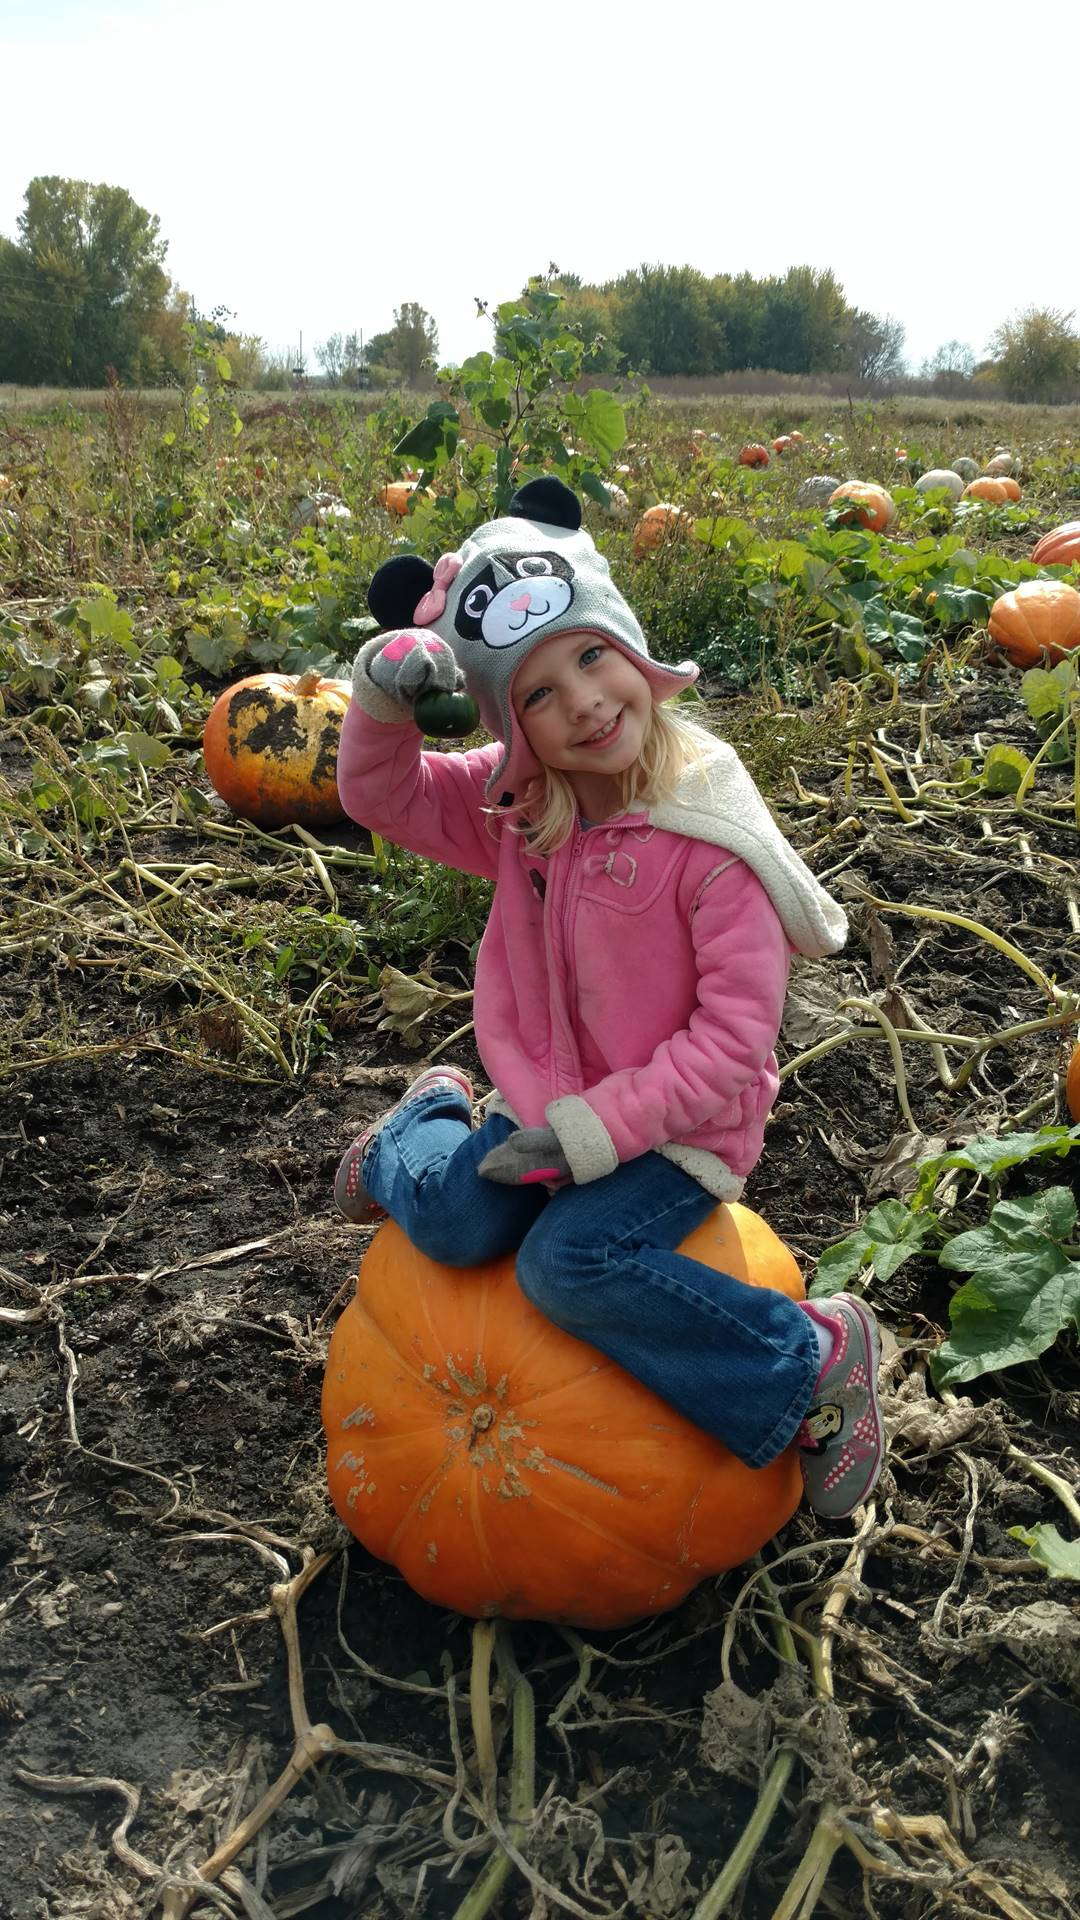 Student sitting on a pumpkin